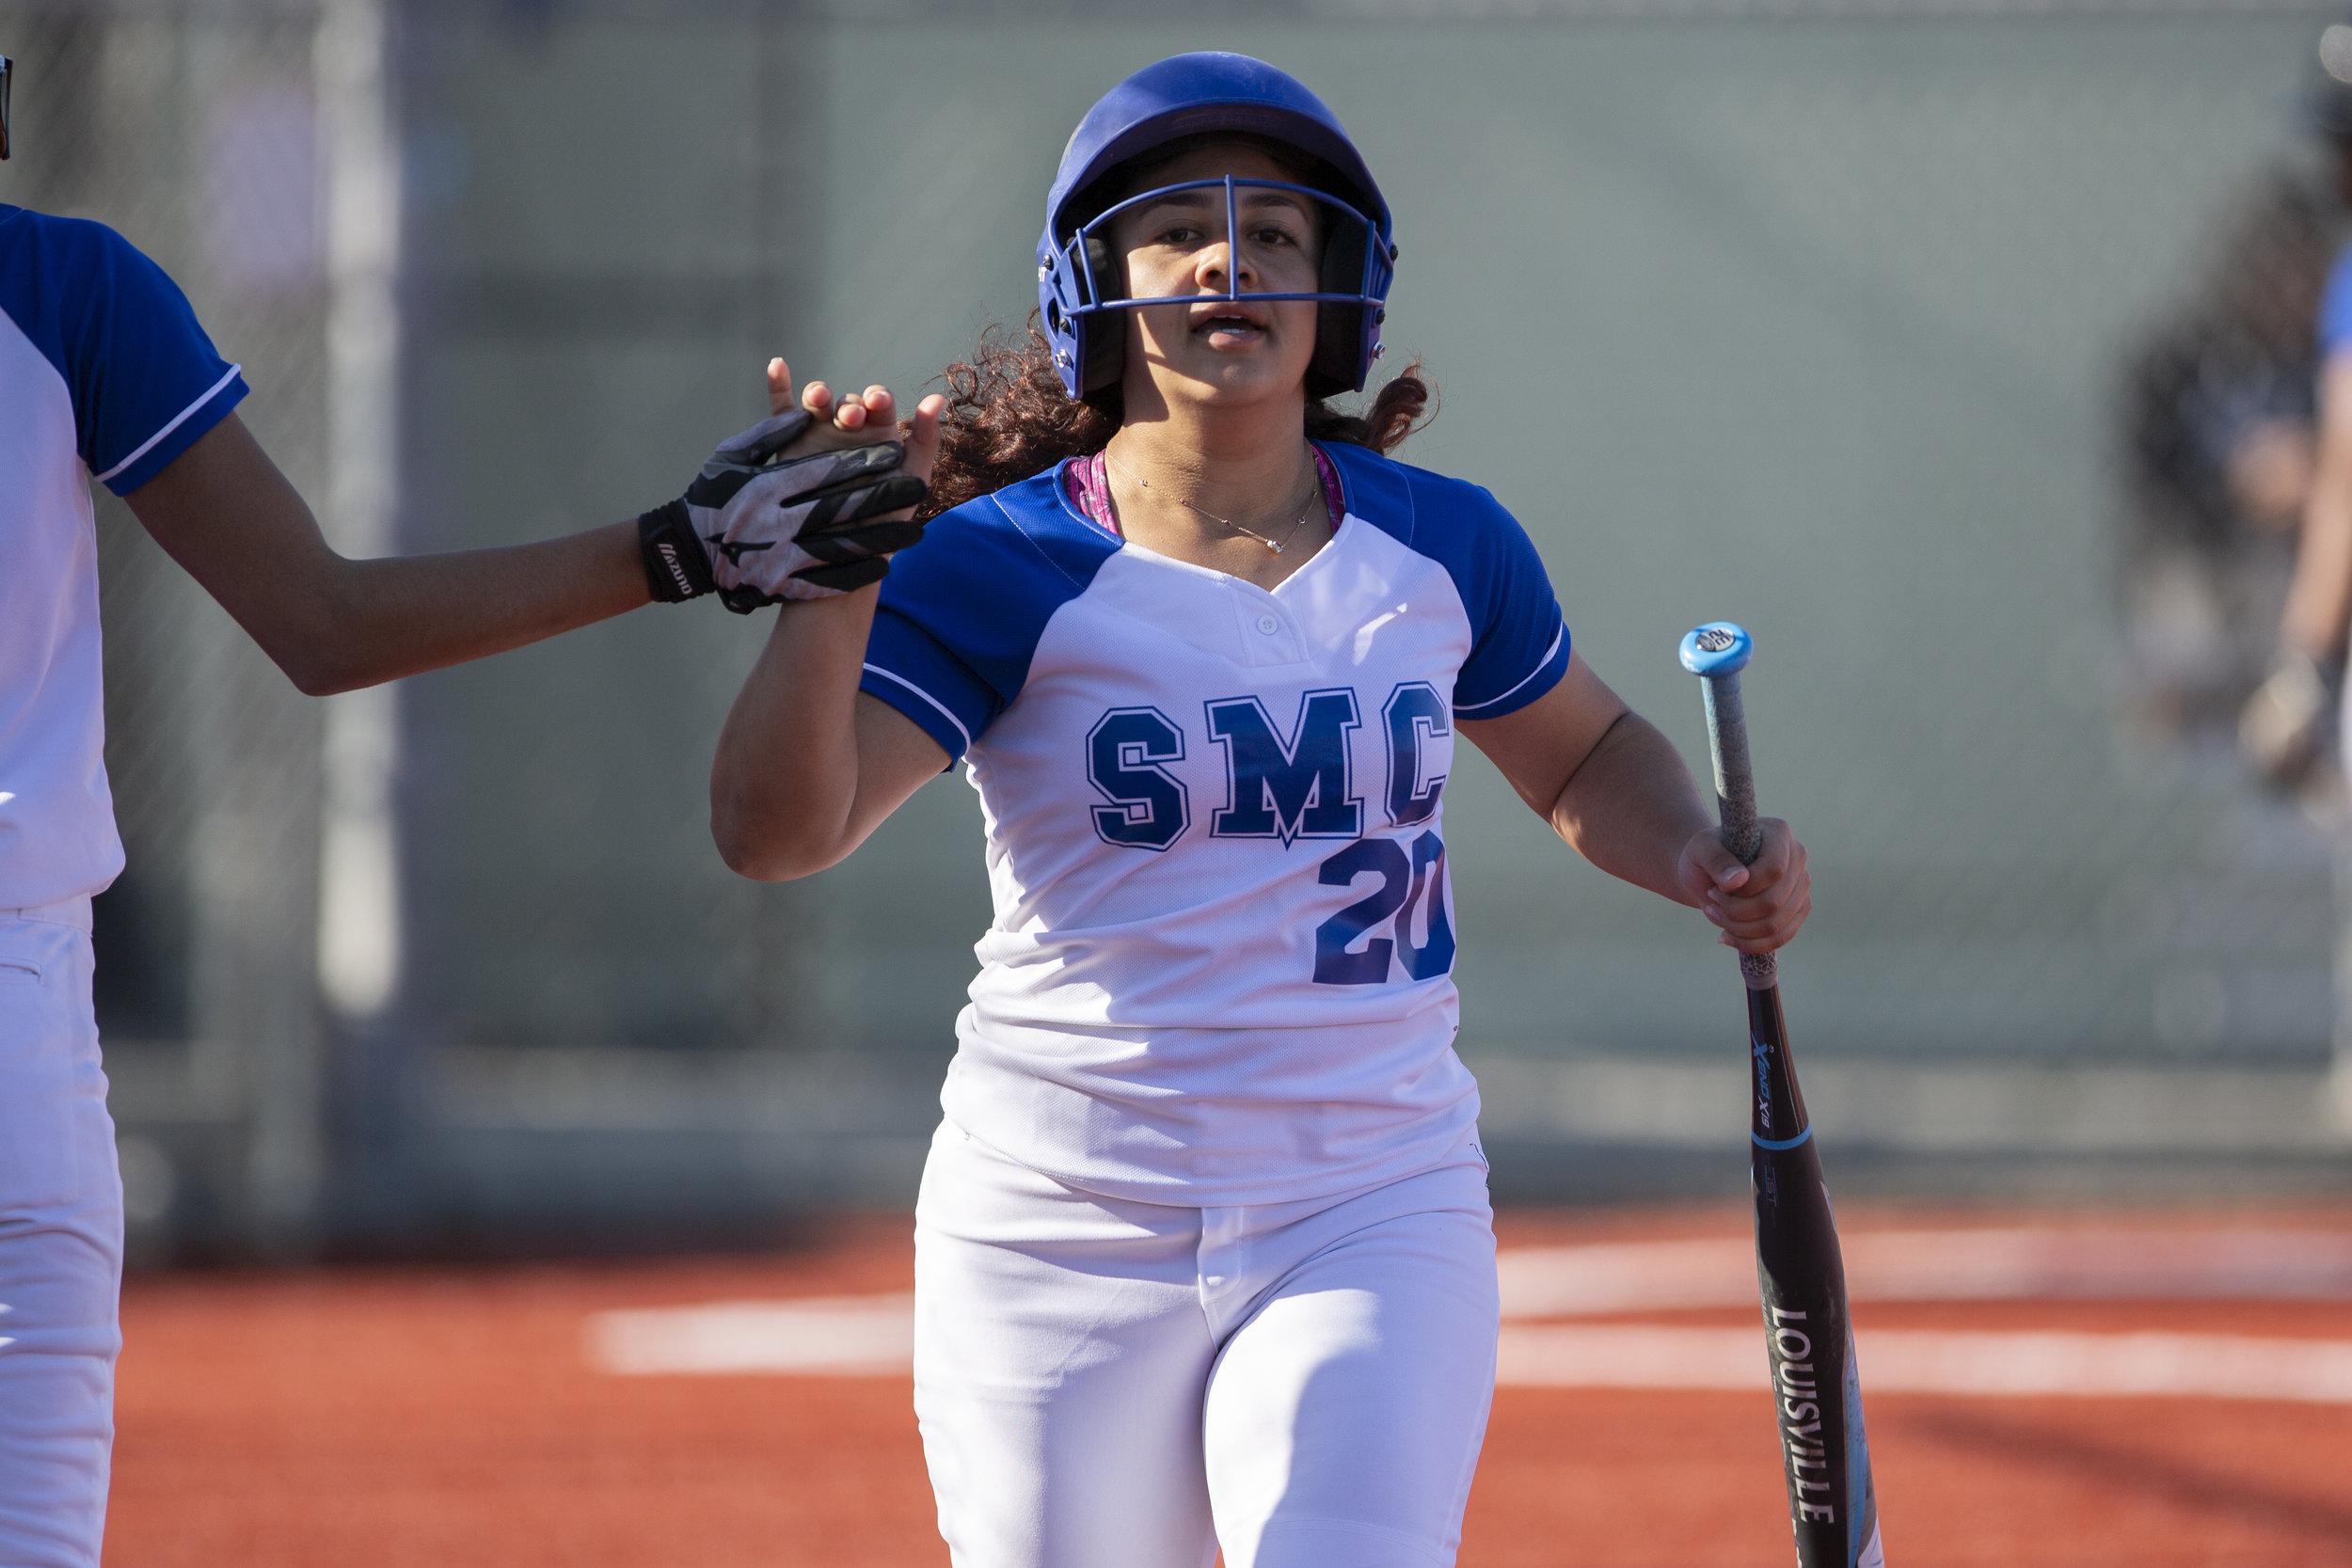 Nikki Valdez, from Santa Monica College softball team playing at home vs Moorpark team, Thursday, March 7, 2019 in Santa Monica, Calif.